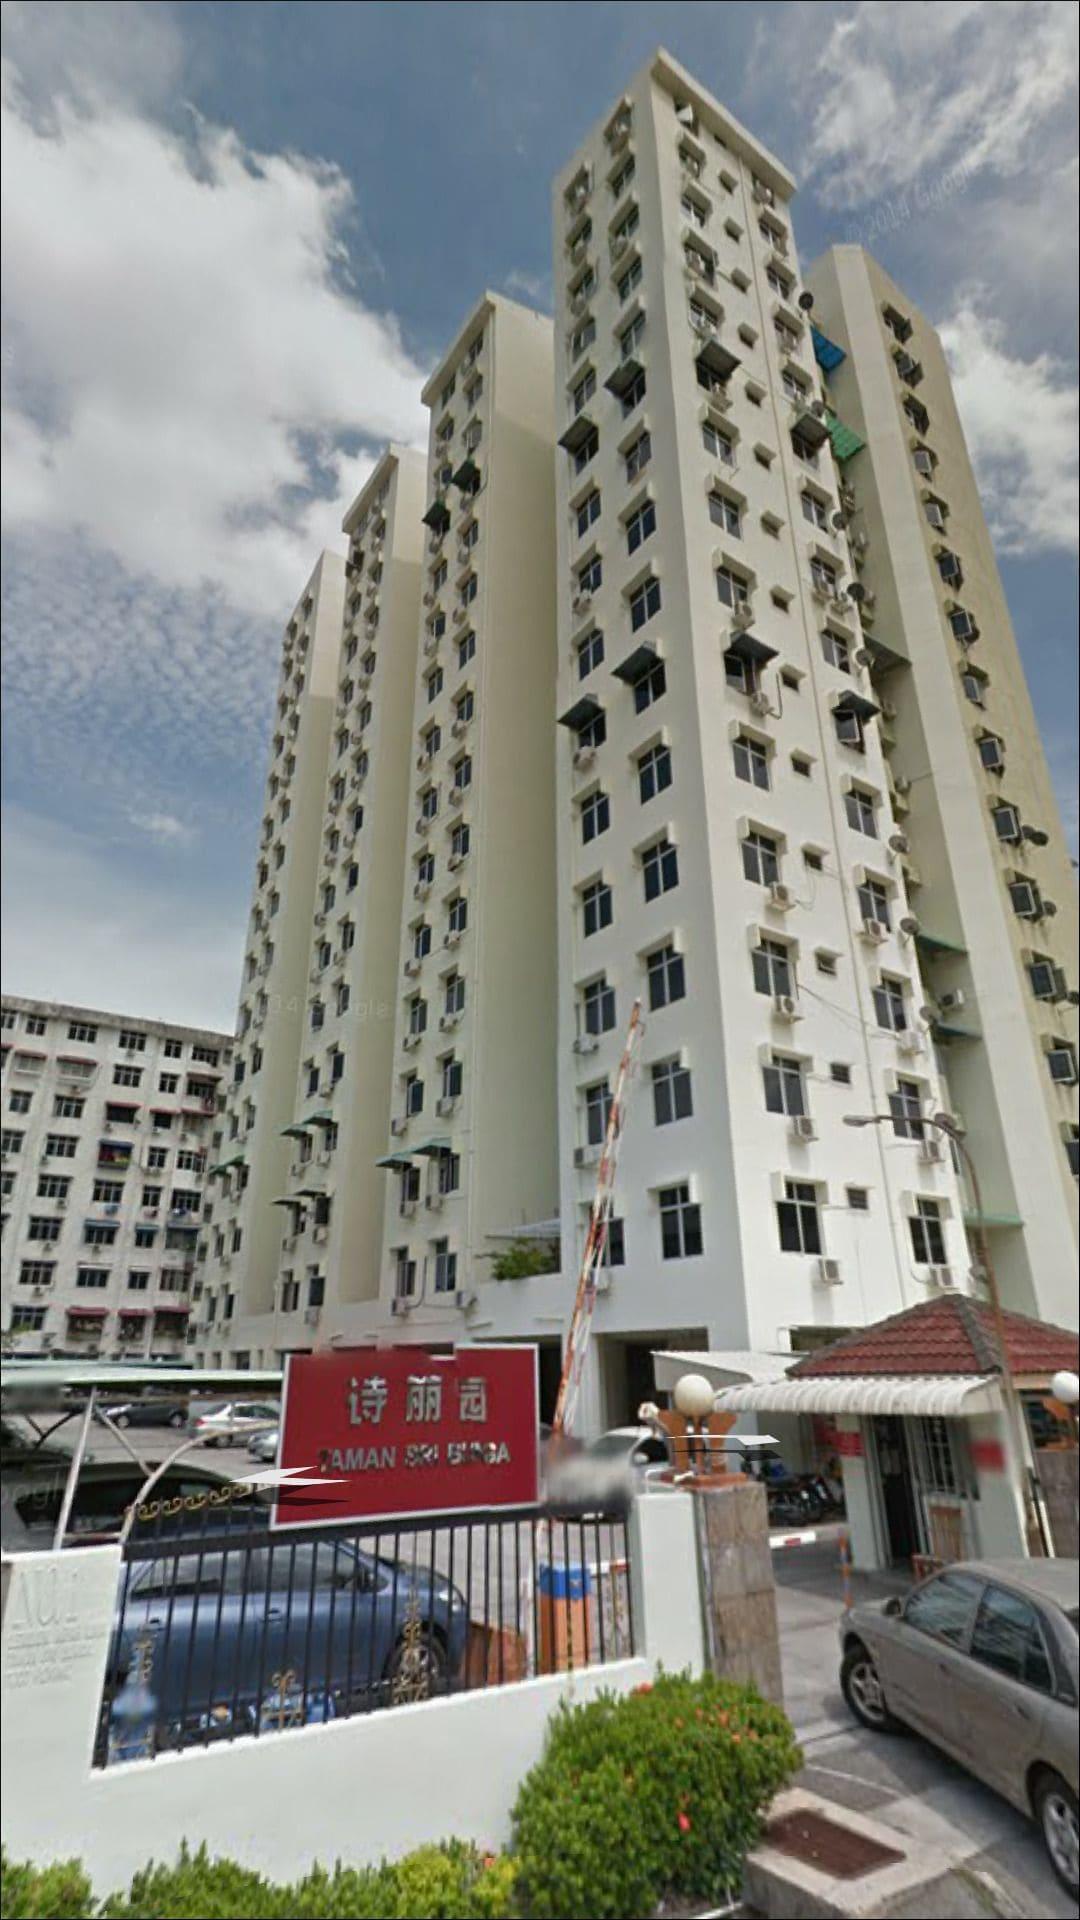 7F, No.2 Taman Sri Bunga Apartment, Pulau Penang